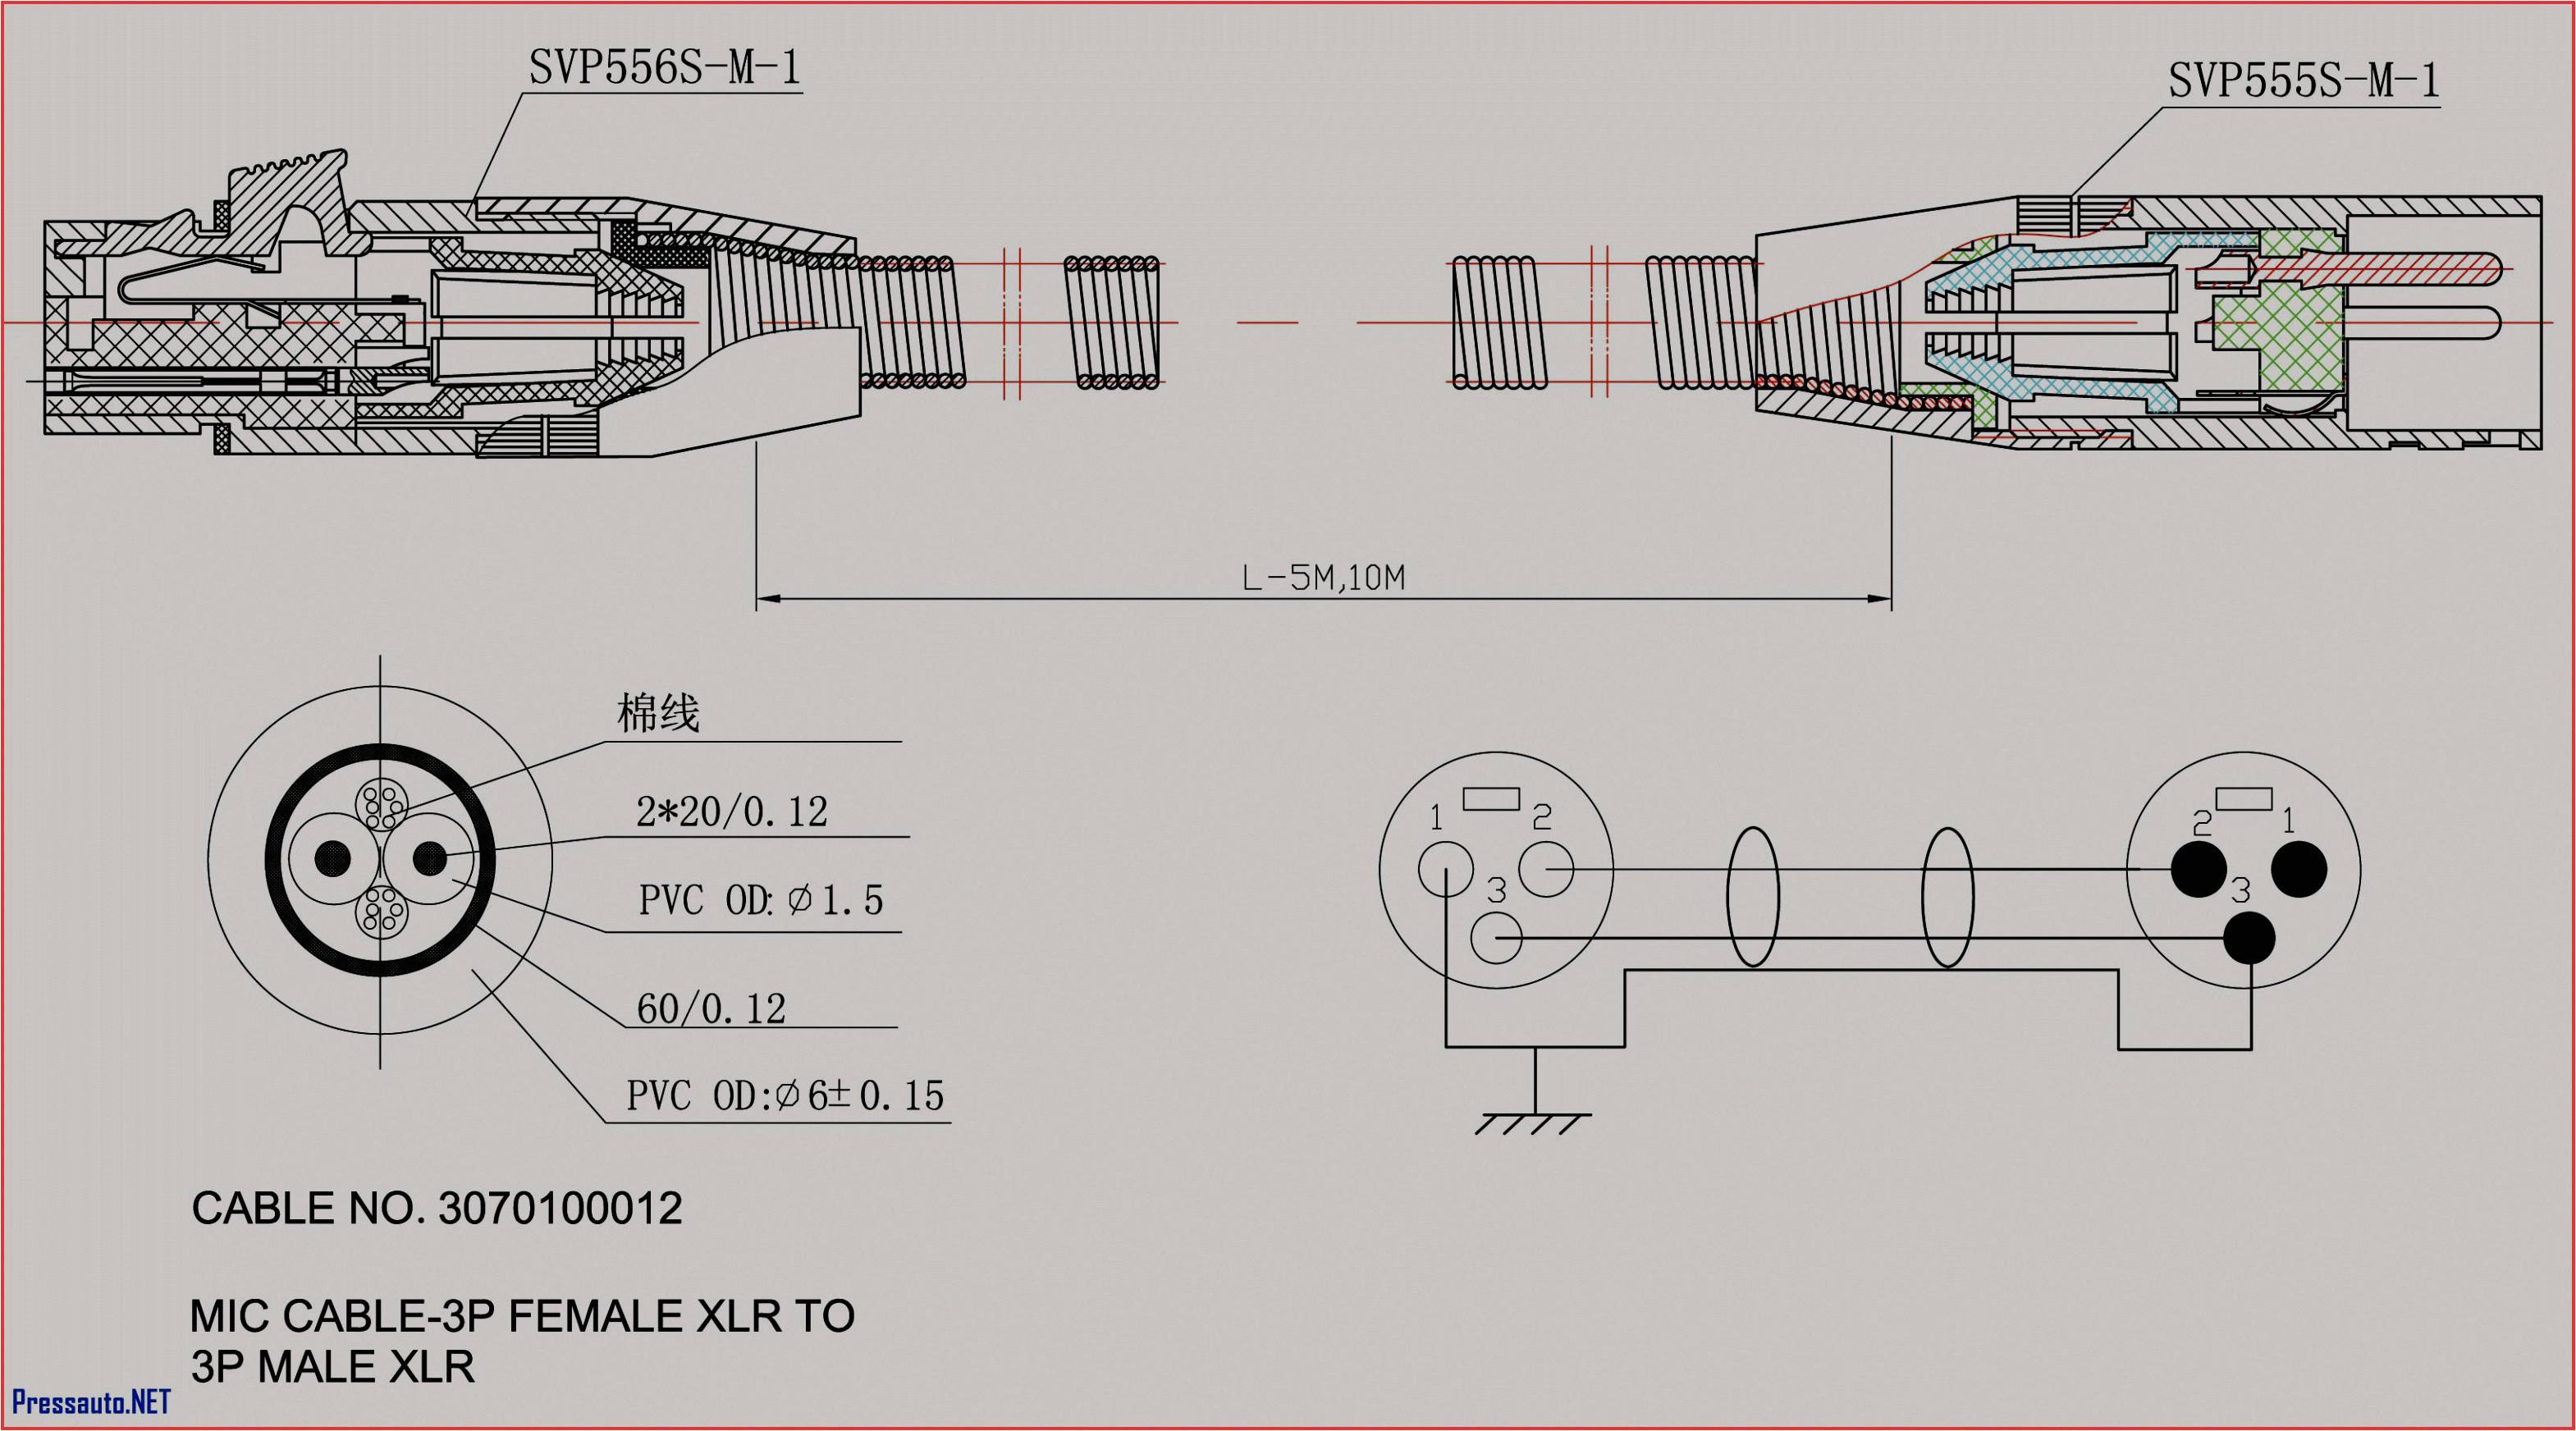 arco wiring diagrams wiring diagram mega arco roto phase wiring diagram